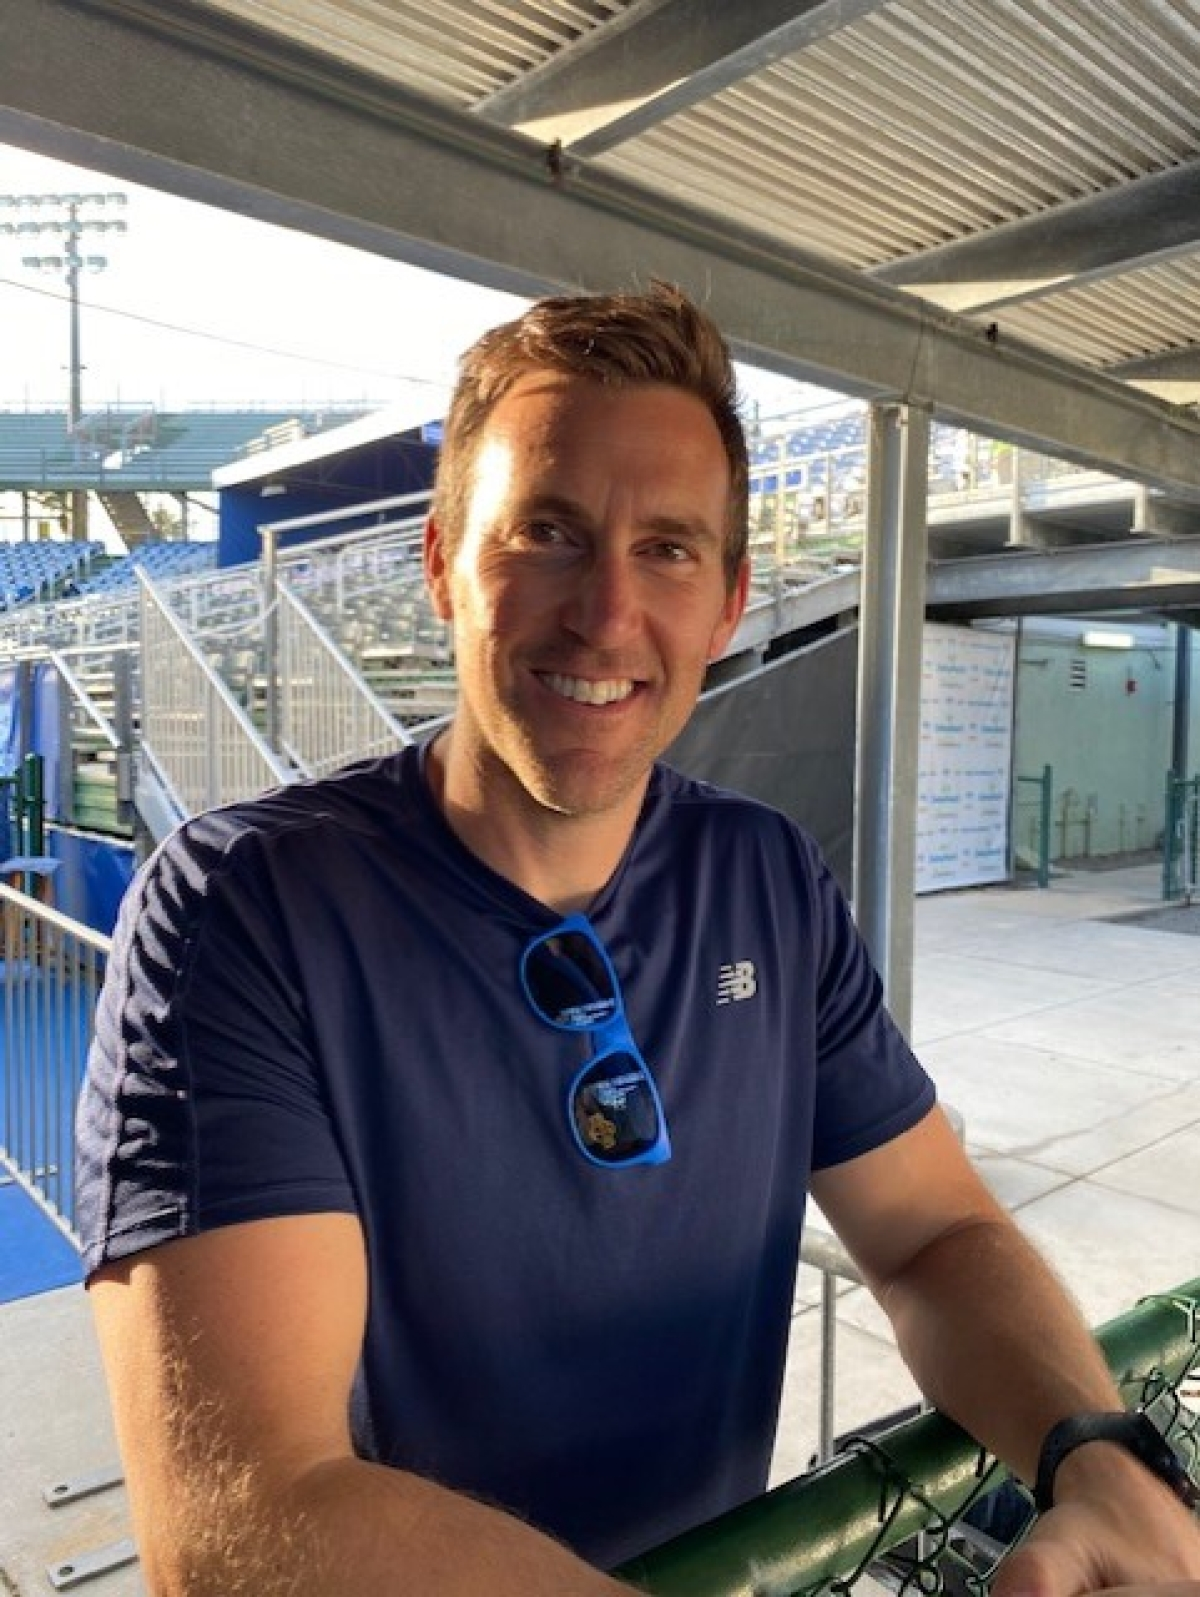 Brett Waltz, at the Delray Beach Open.